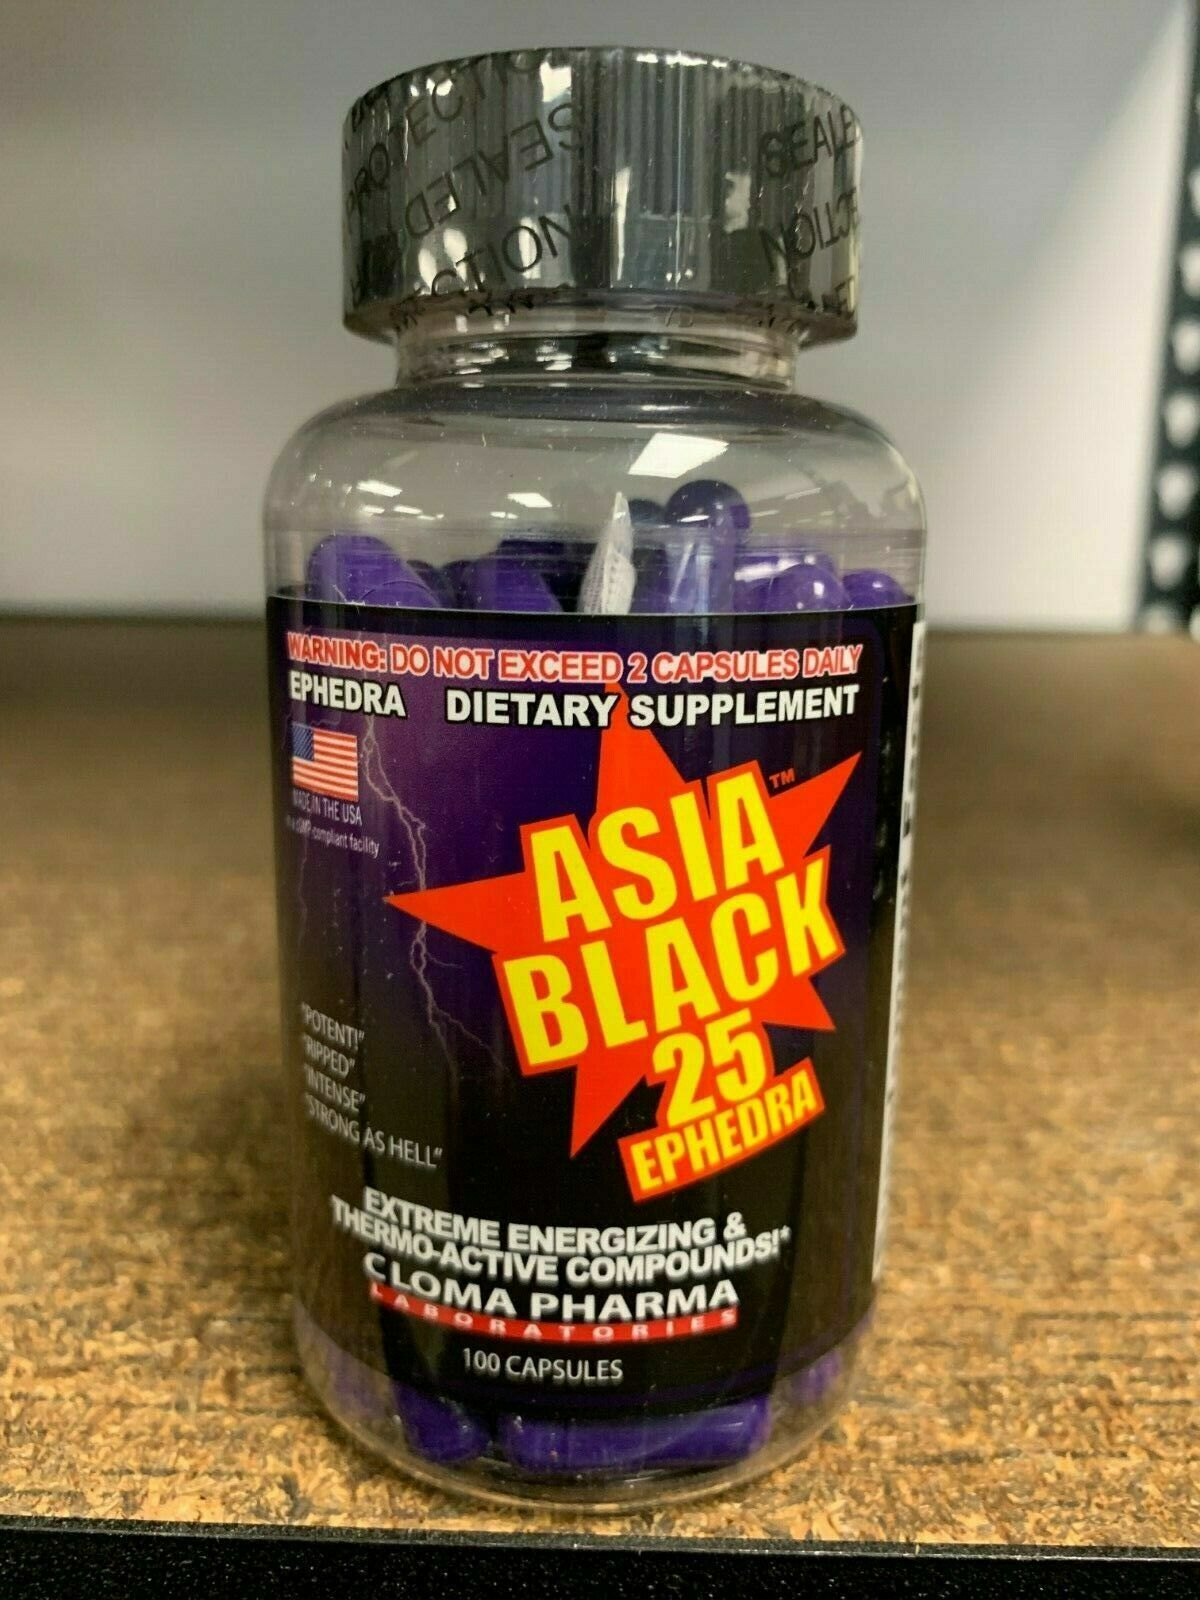 Cloma Pharma Asia Black Extreme Thermogenic Fat Burner Fast Free Shipping